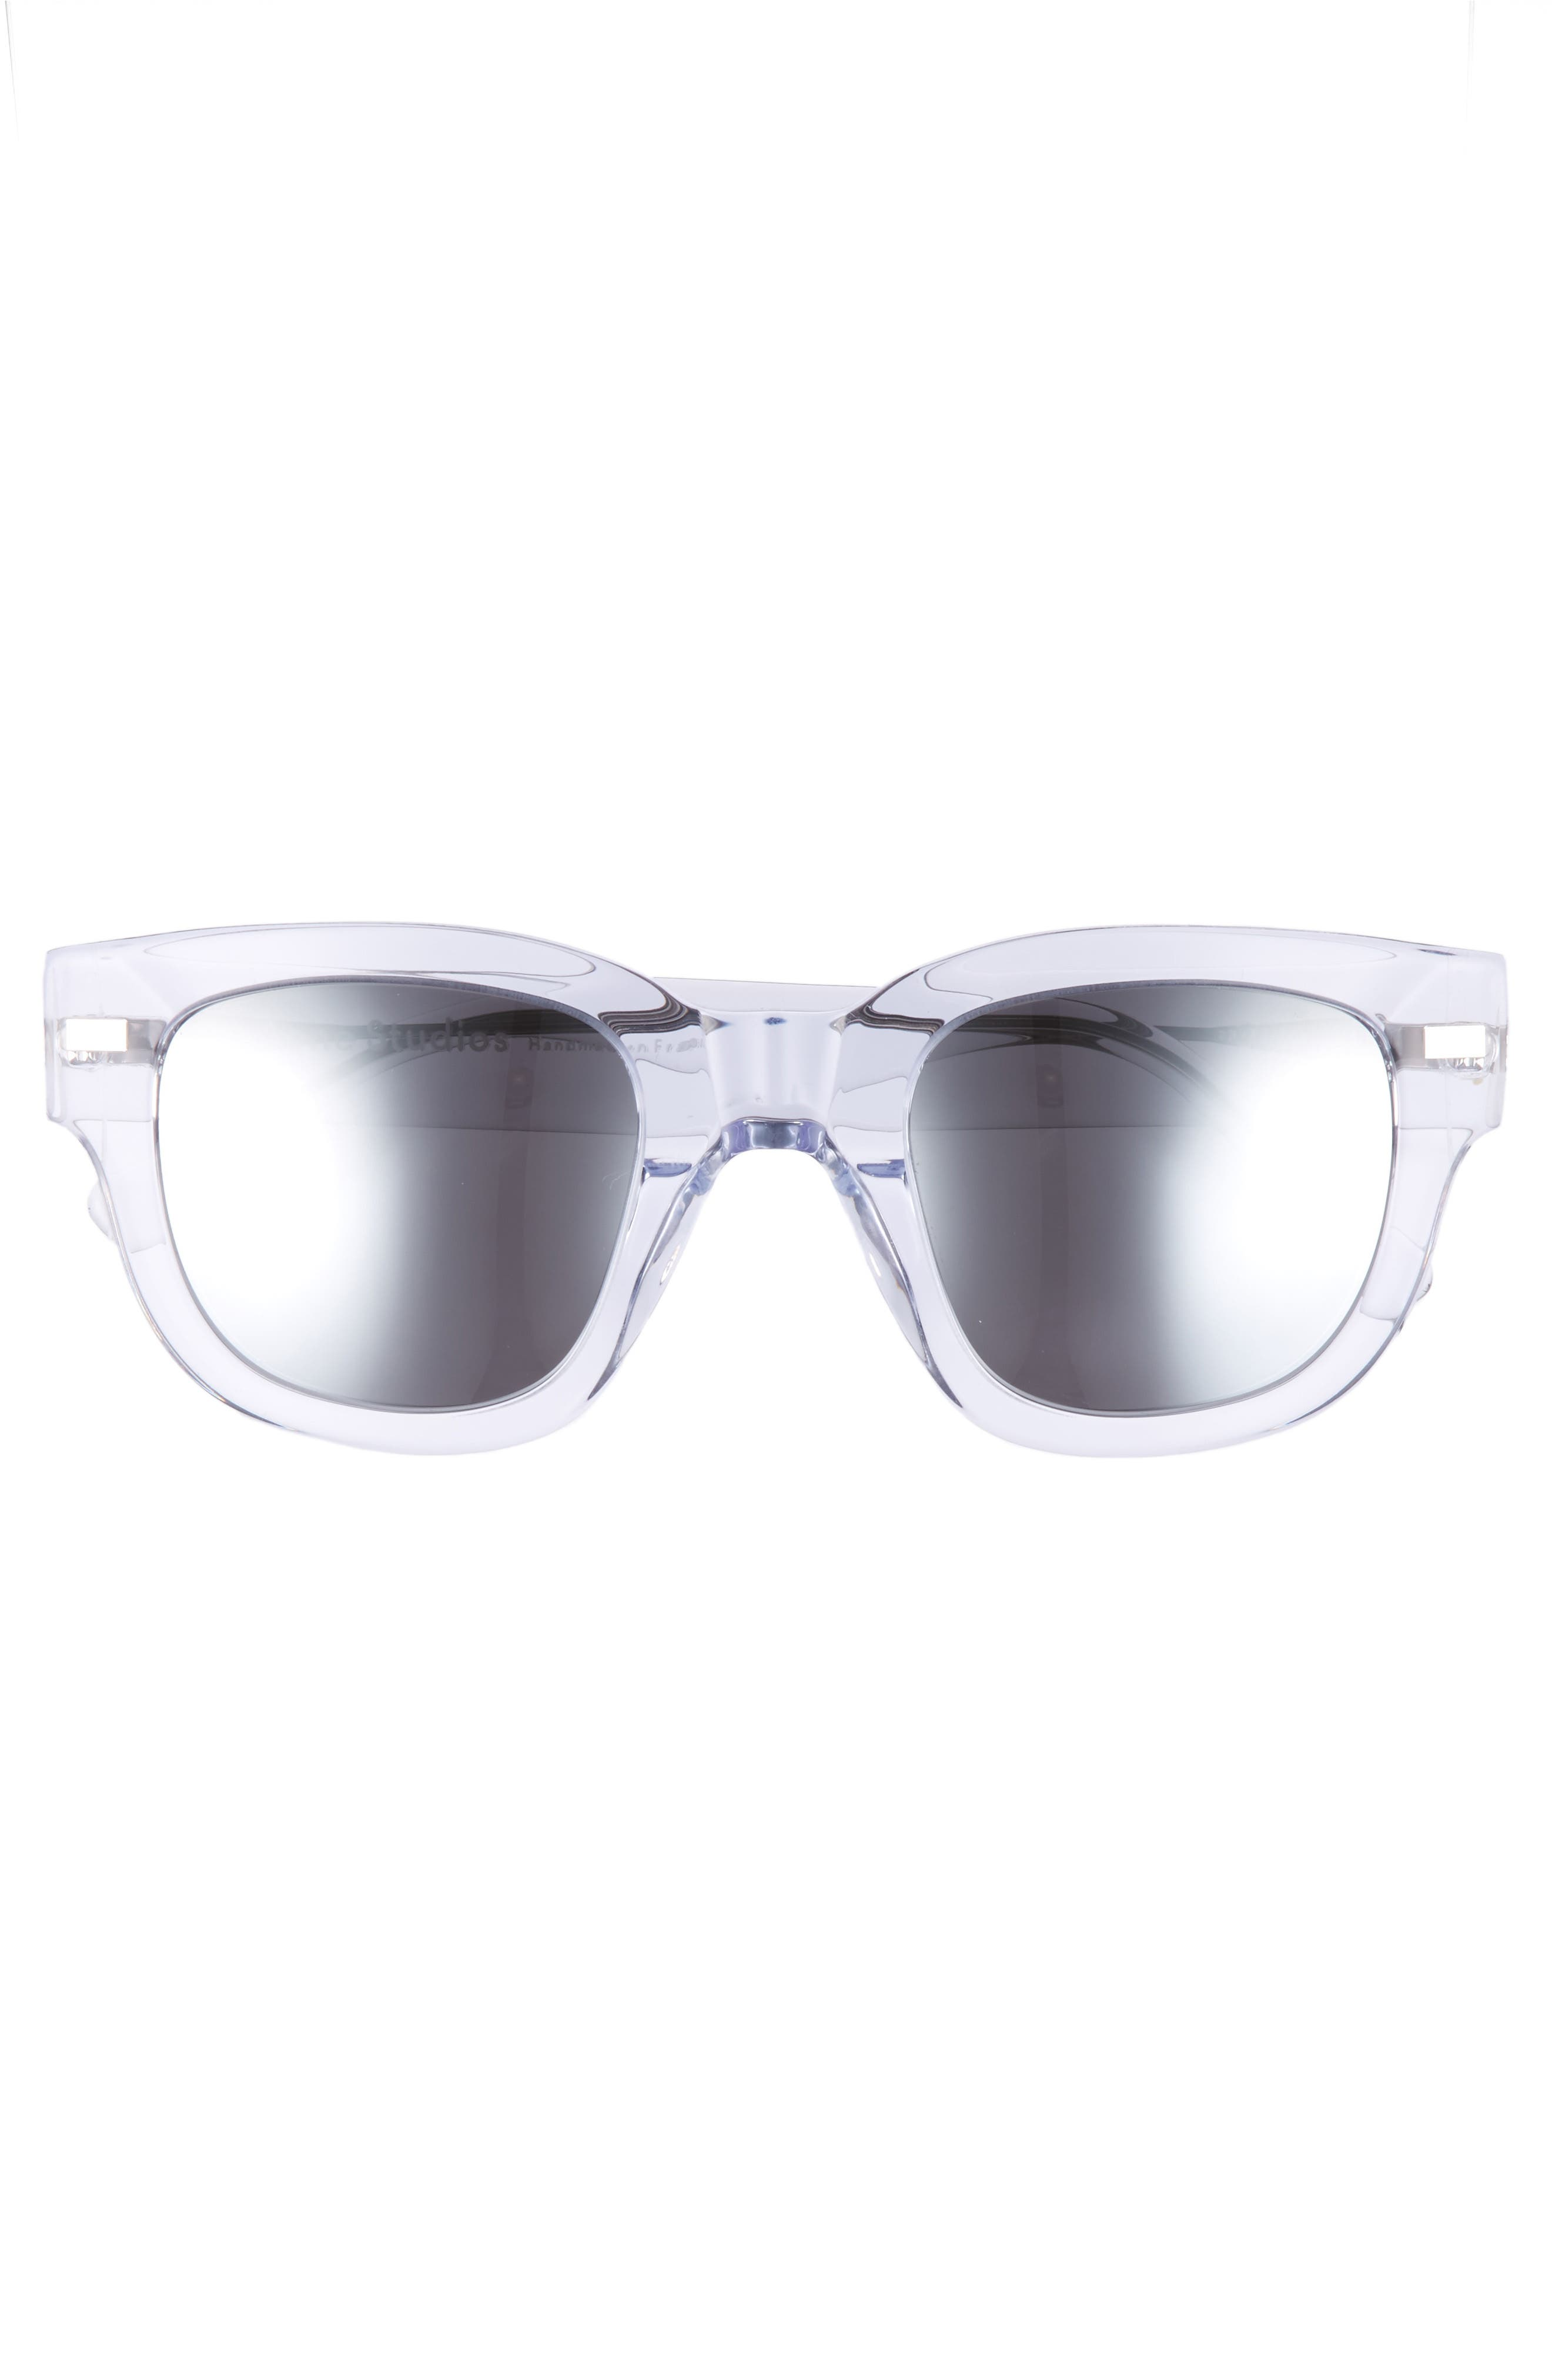 47mm Sunglasses,                             Alternate thumbnail 5, color,